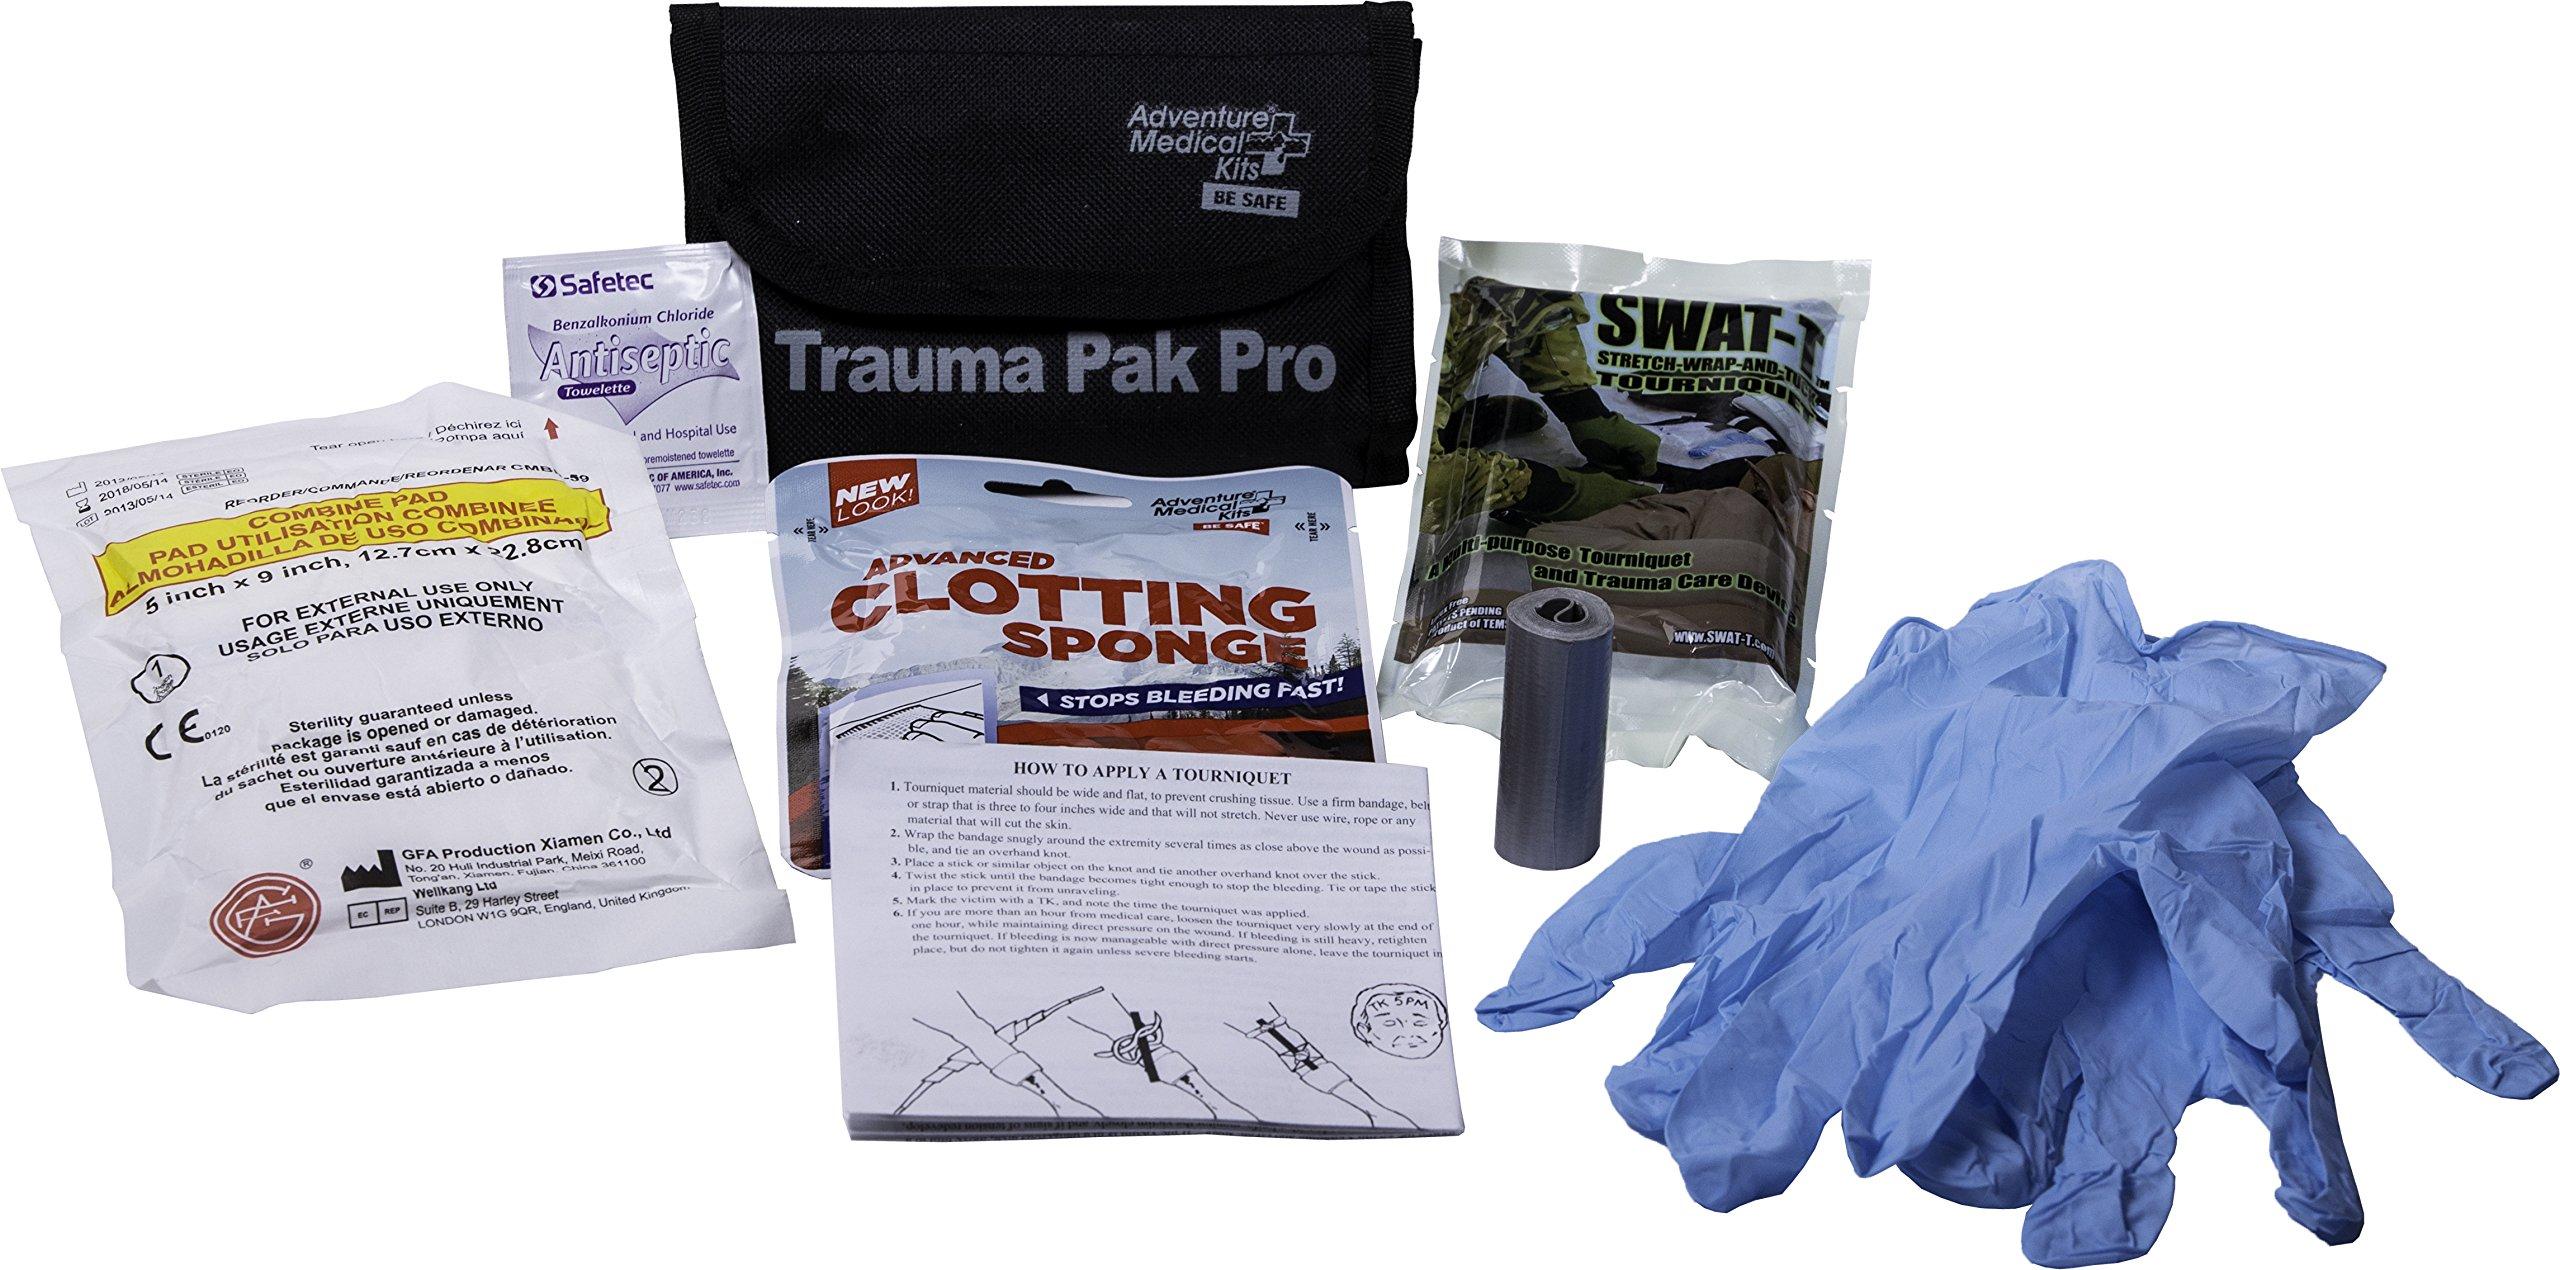 Adventure Medical Kits Professional Series Trauma Pak Pro